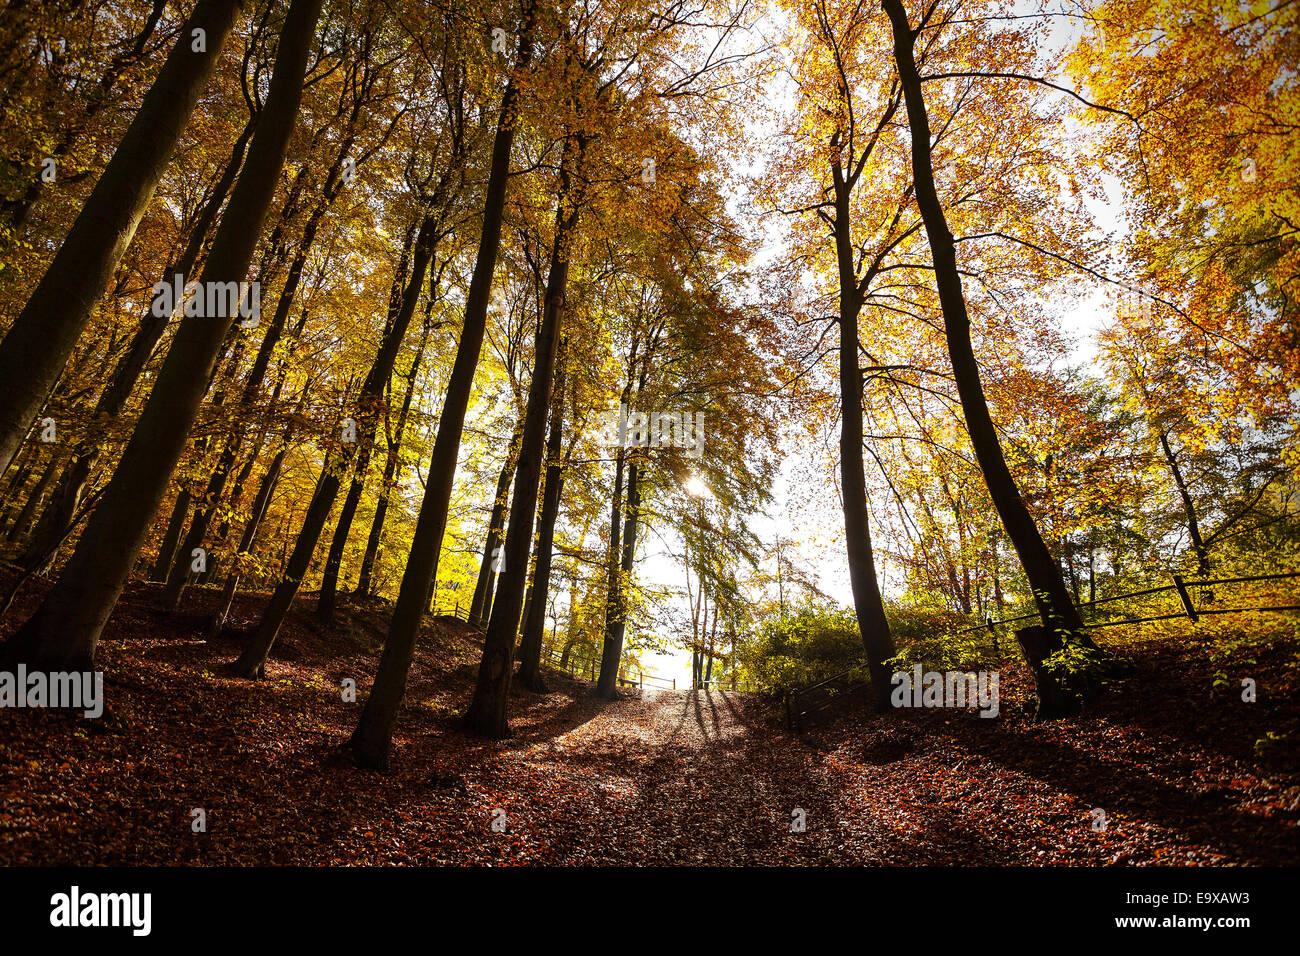 Mysterious autumn forest landscape. - Stock Image